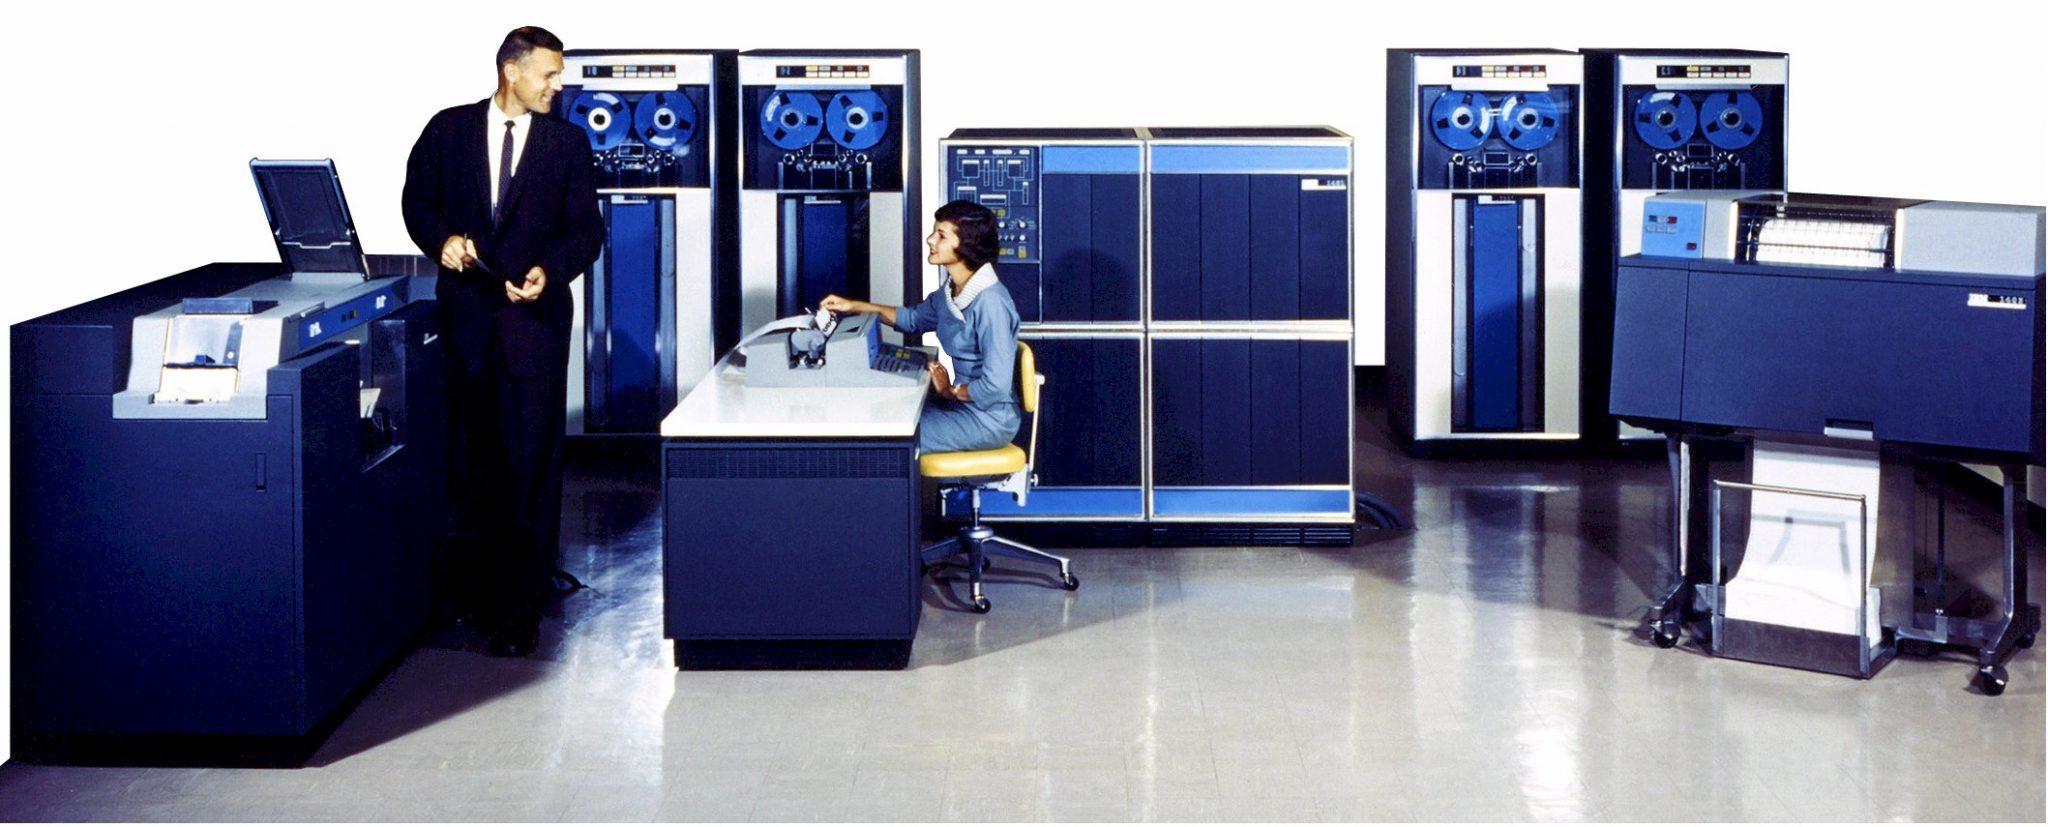 IBM 4381 Model 21 Main Frame computer